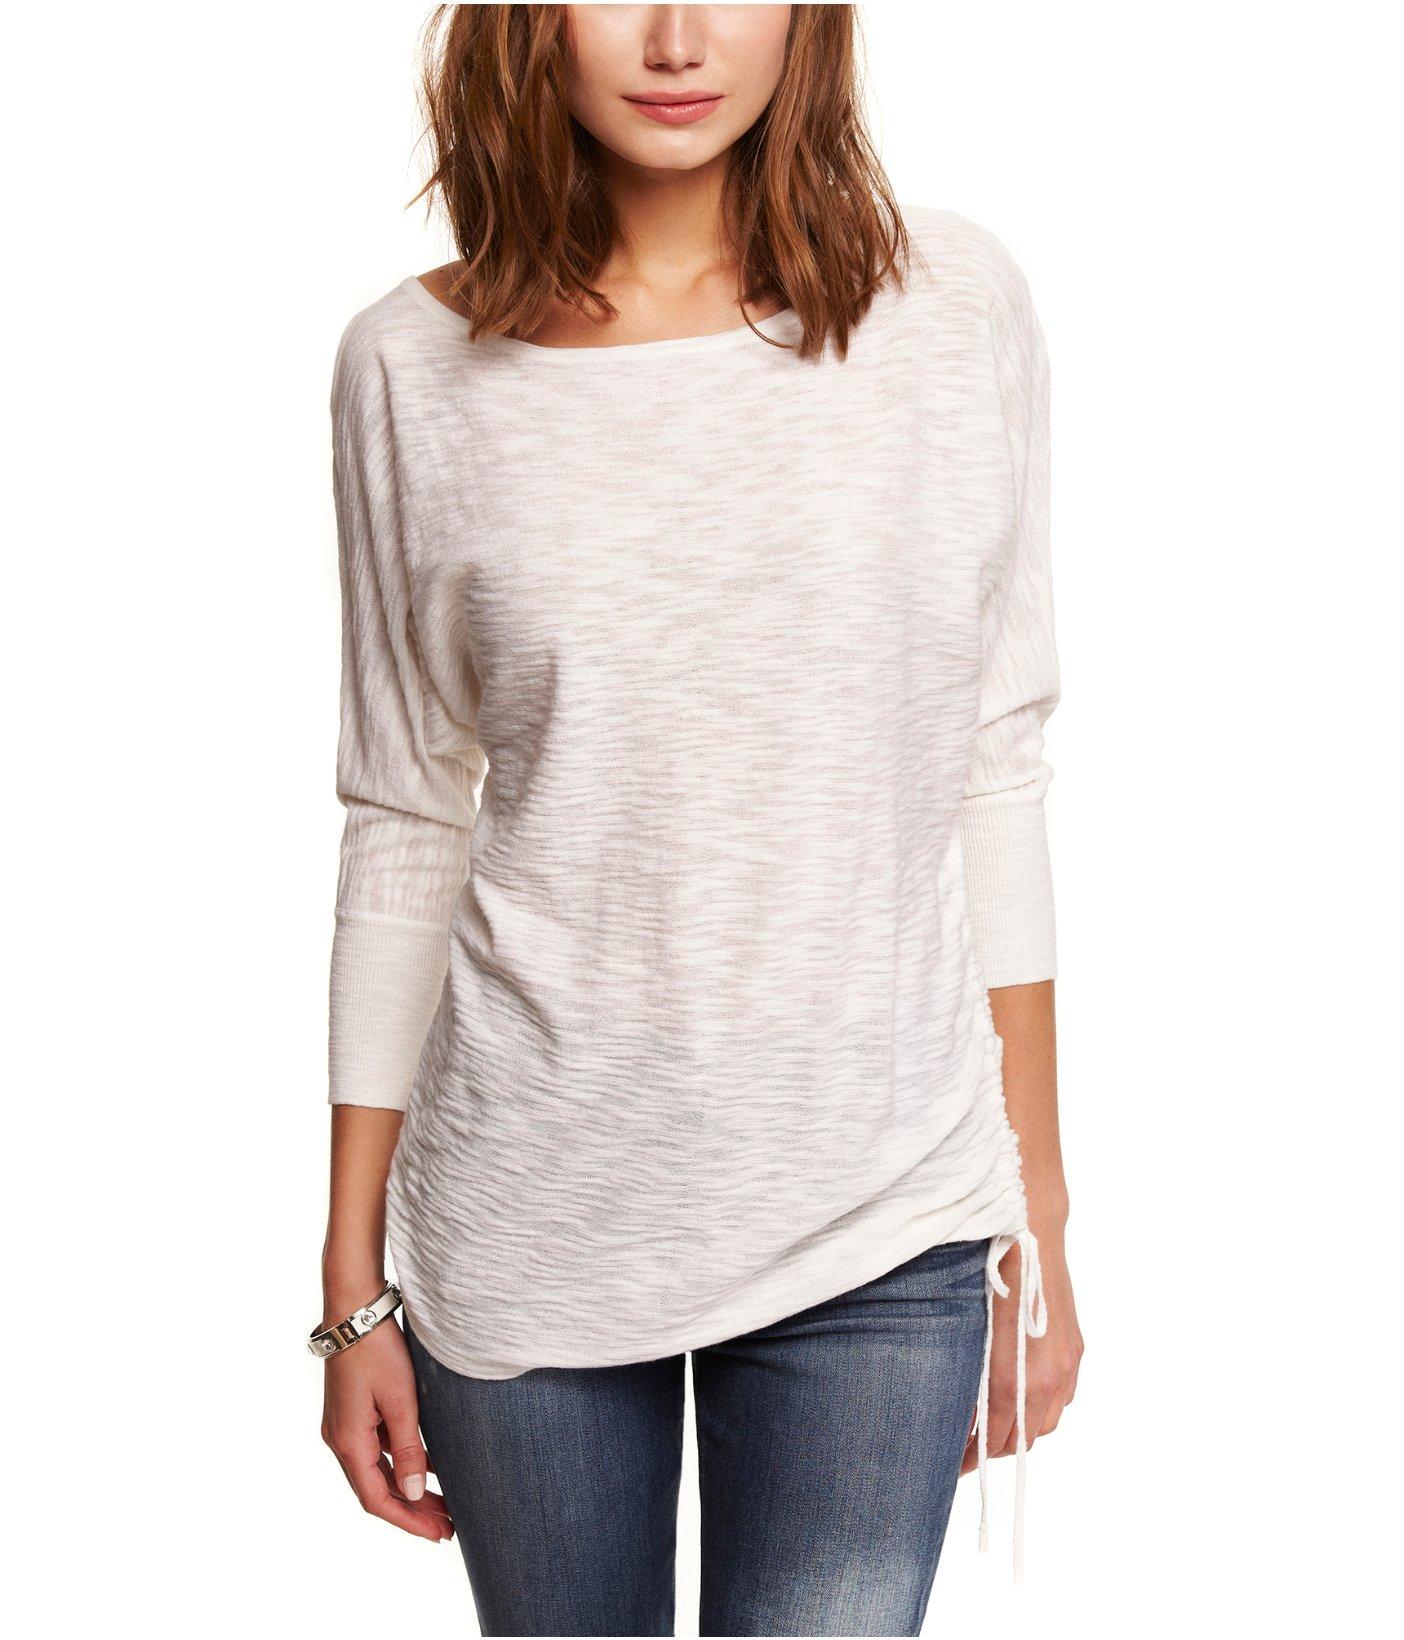 Light Blue Sweater For Women